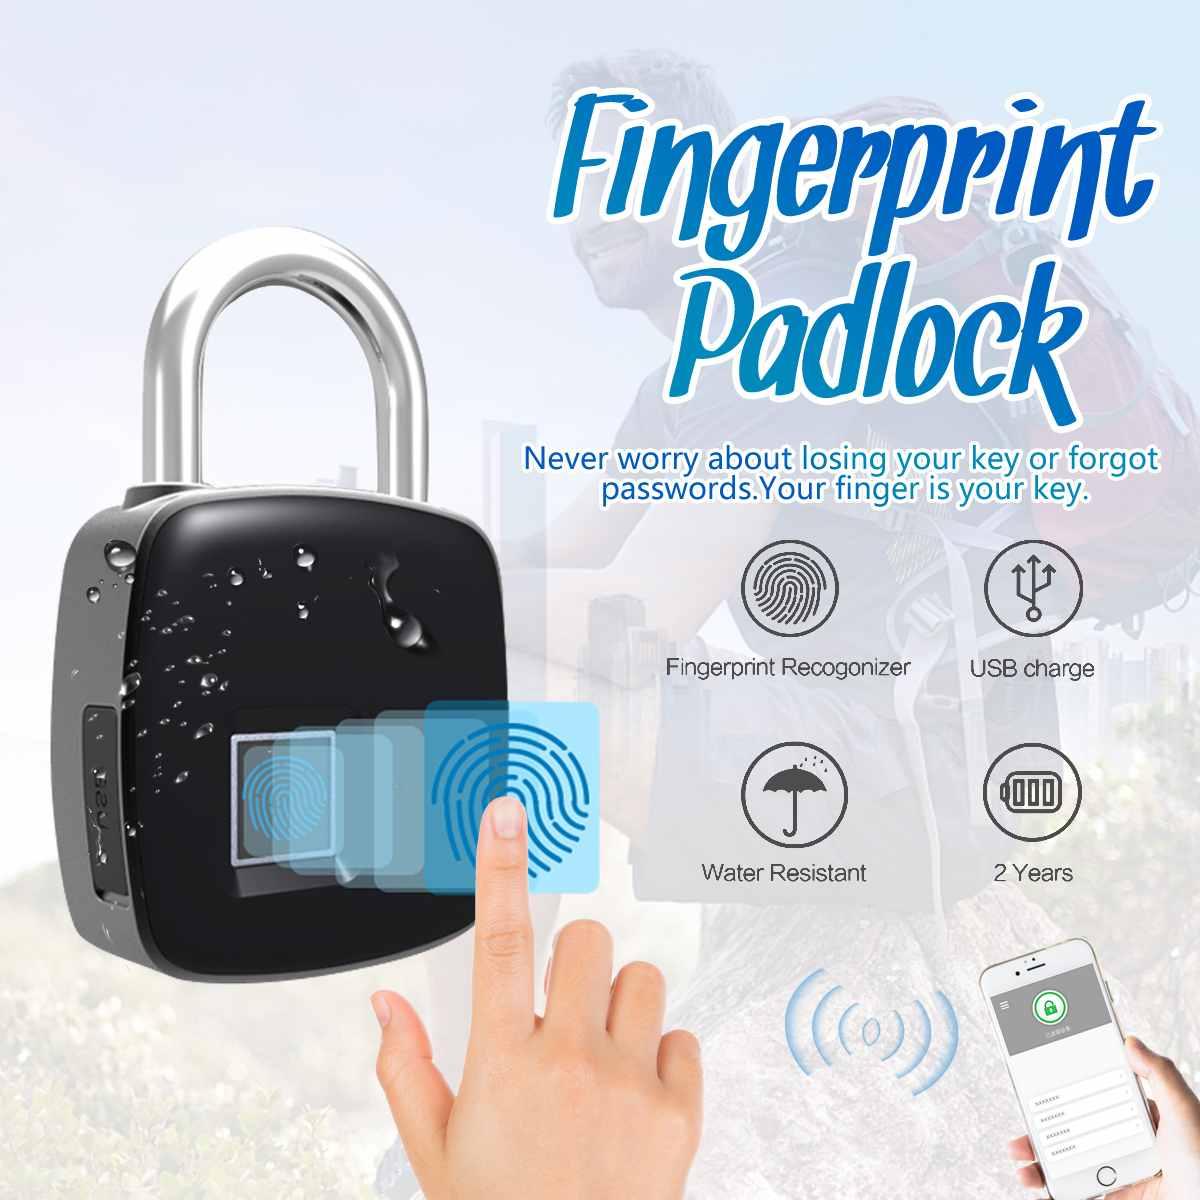 USB Rechargeable Smart Keyless Fingerprint Lock Waterproof Bluetooth Remote Anti-Theft Security Padlock Door Luggage Case Lock